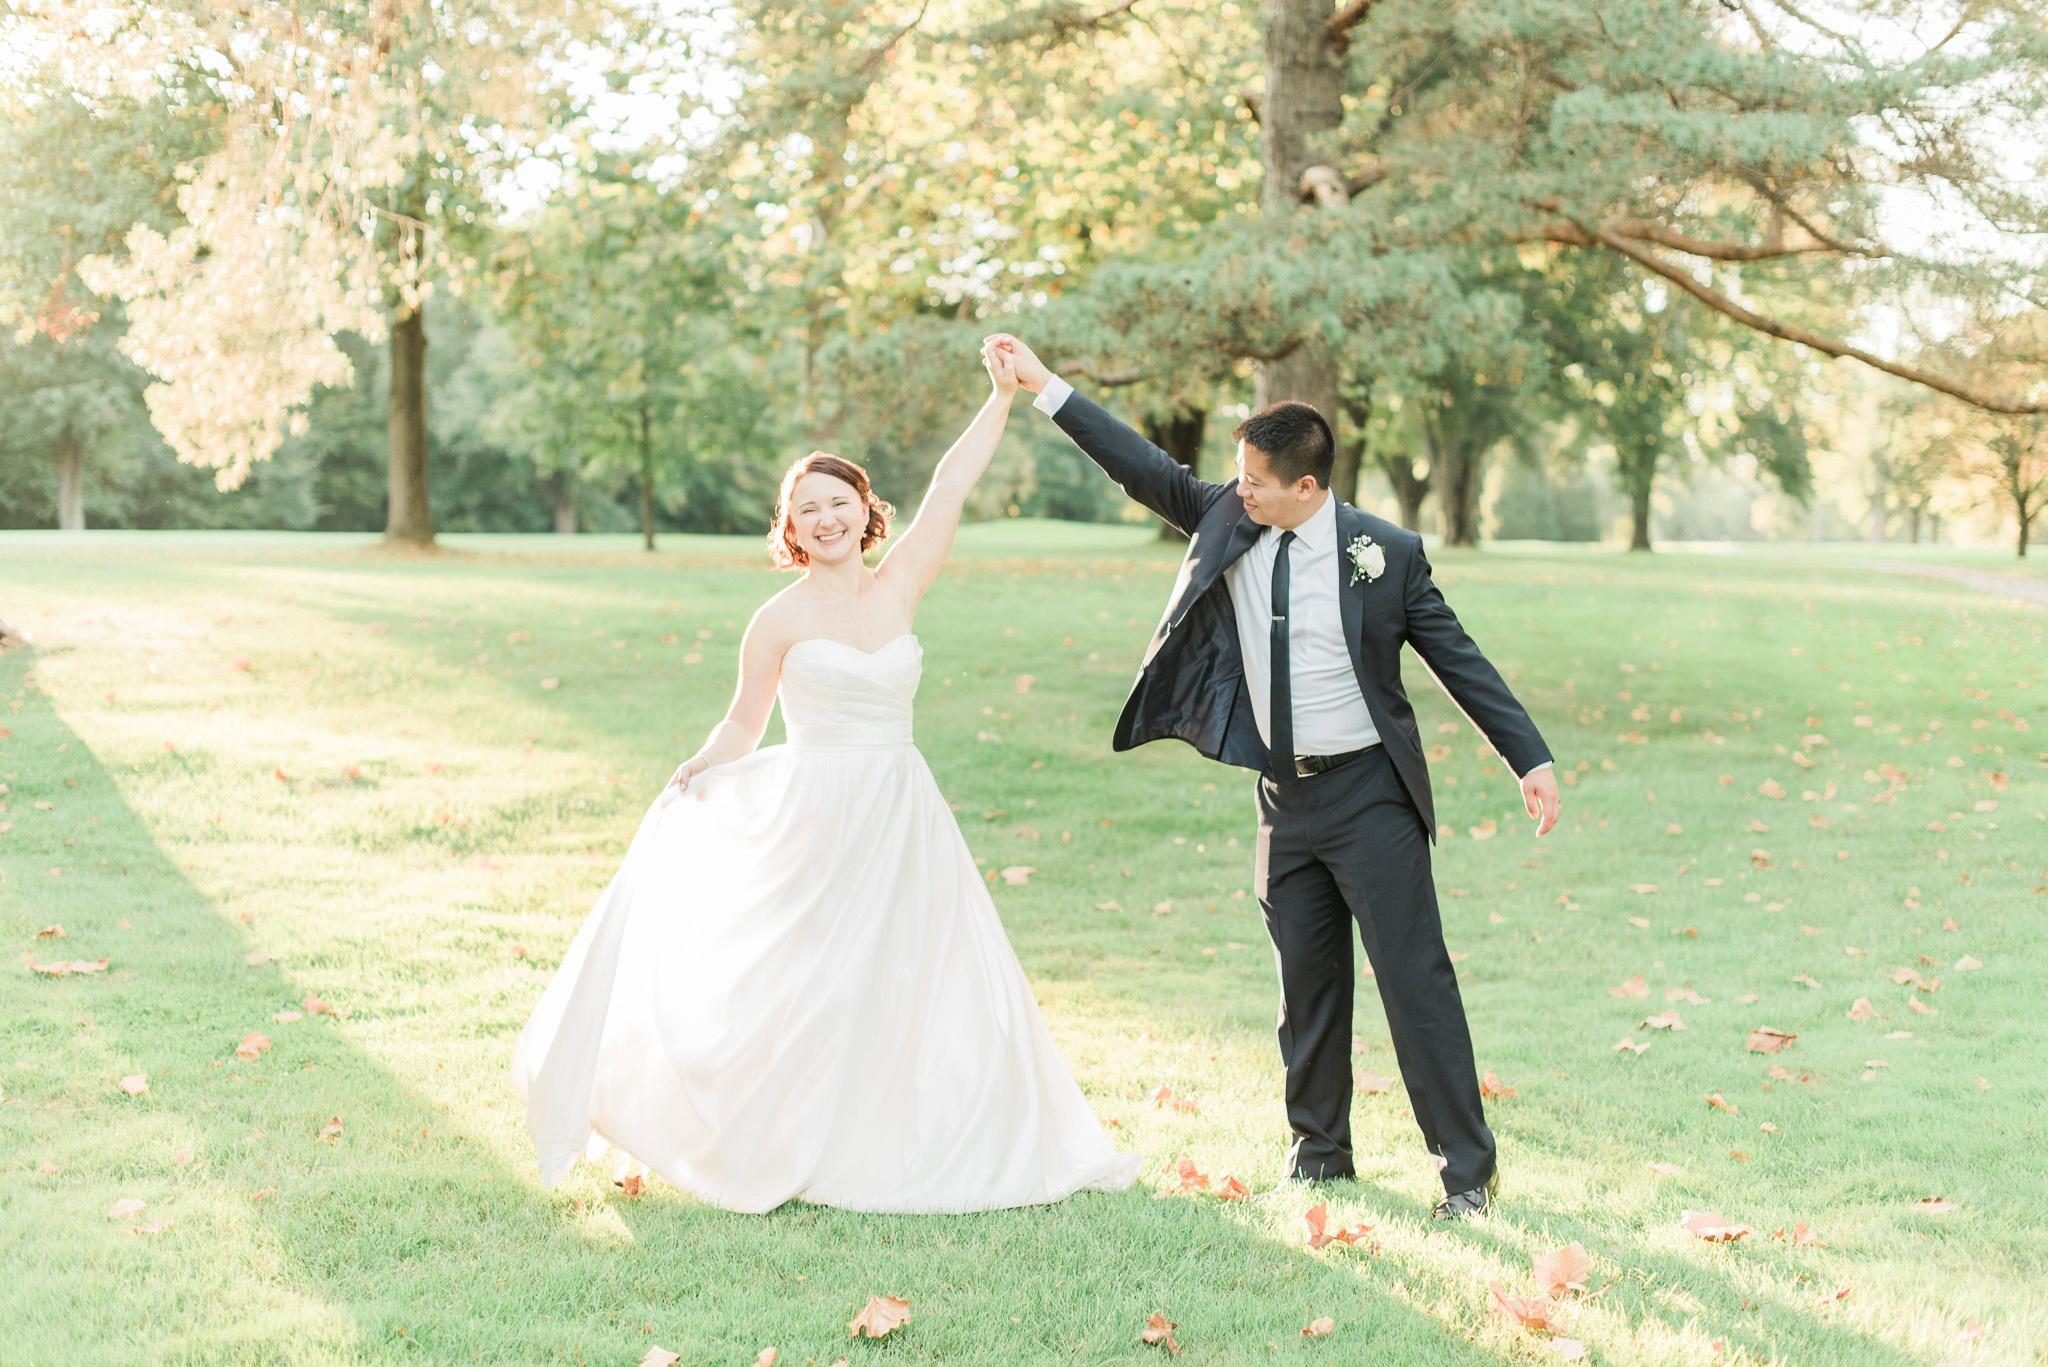 brookside-golf-country-club-wedding-columbus-ohio-122.jpg